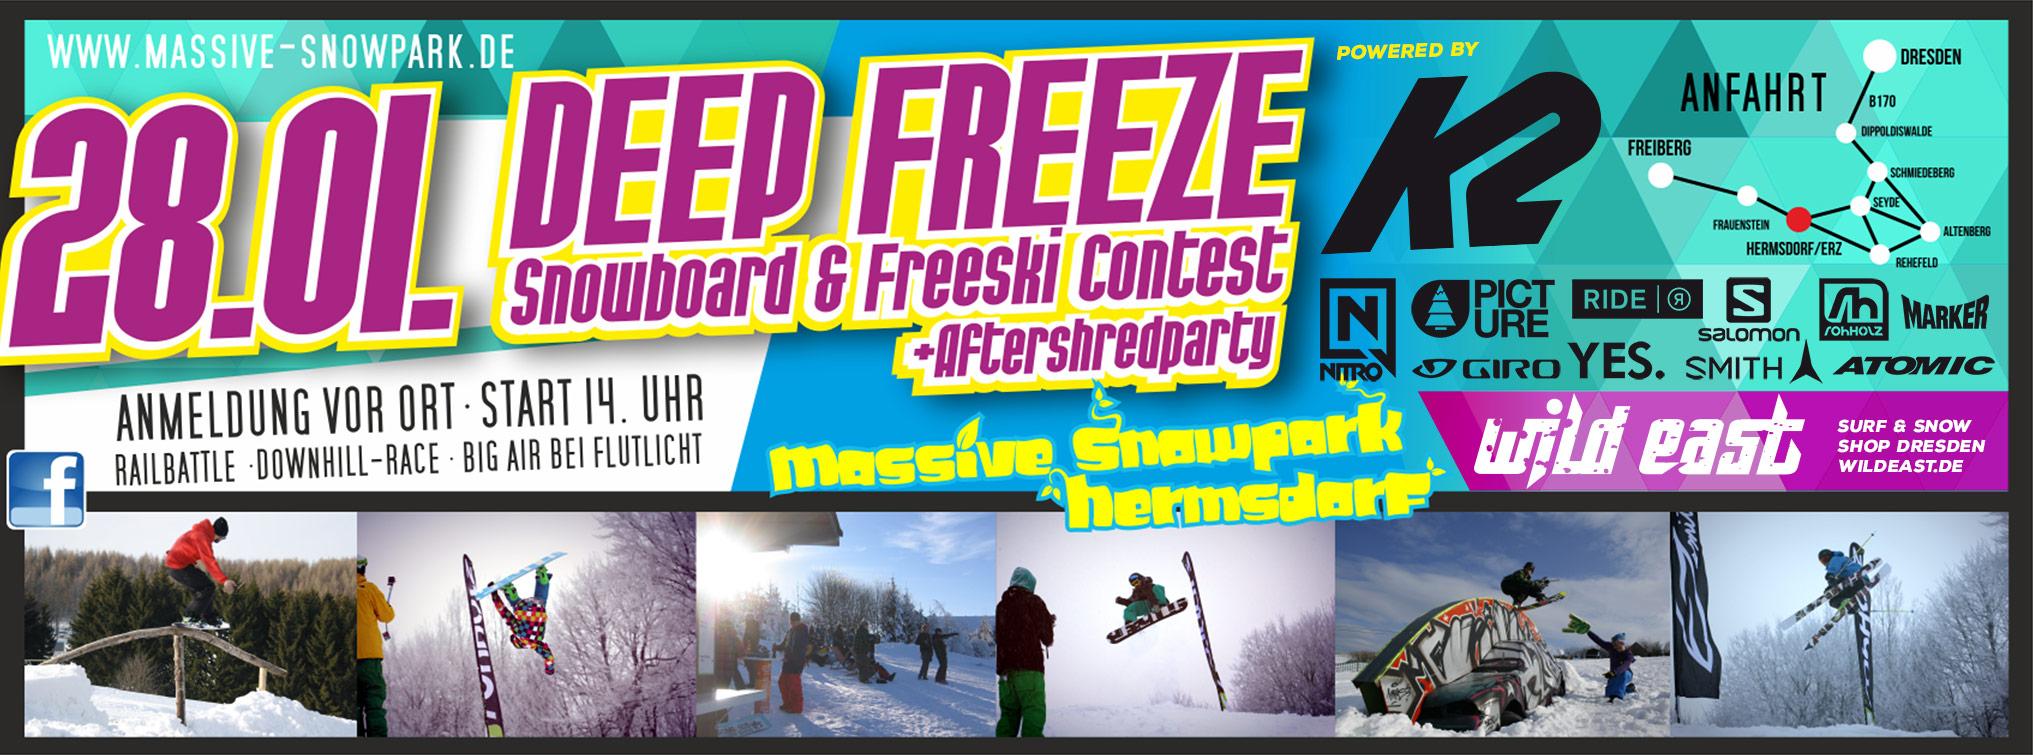 Snowboard & Freeski Contest Hermsdorf